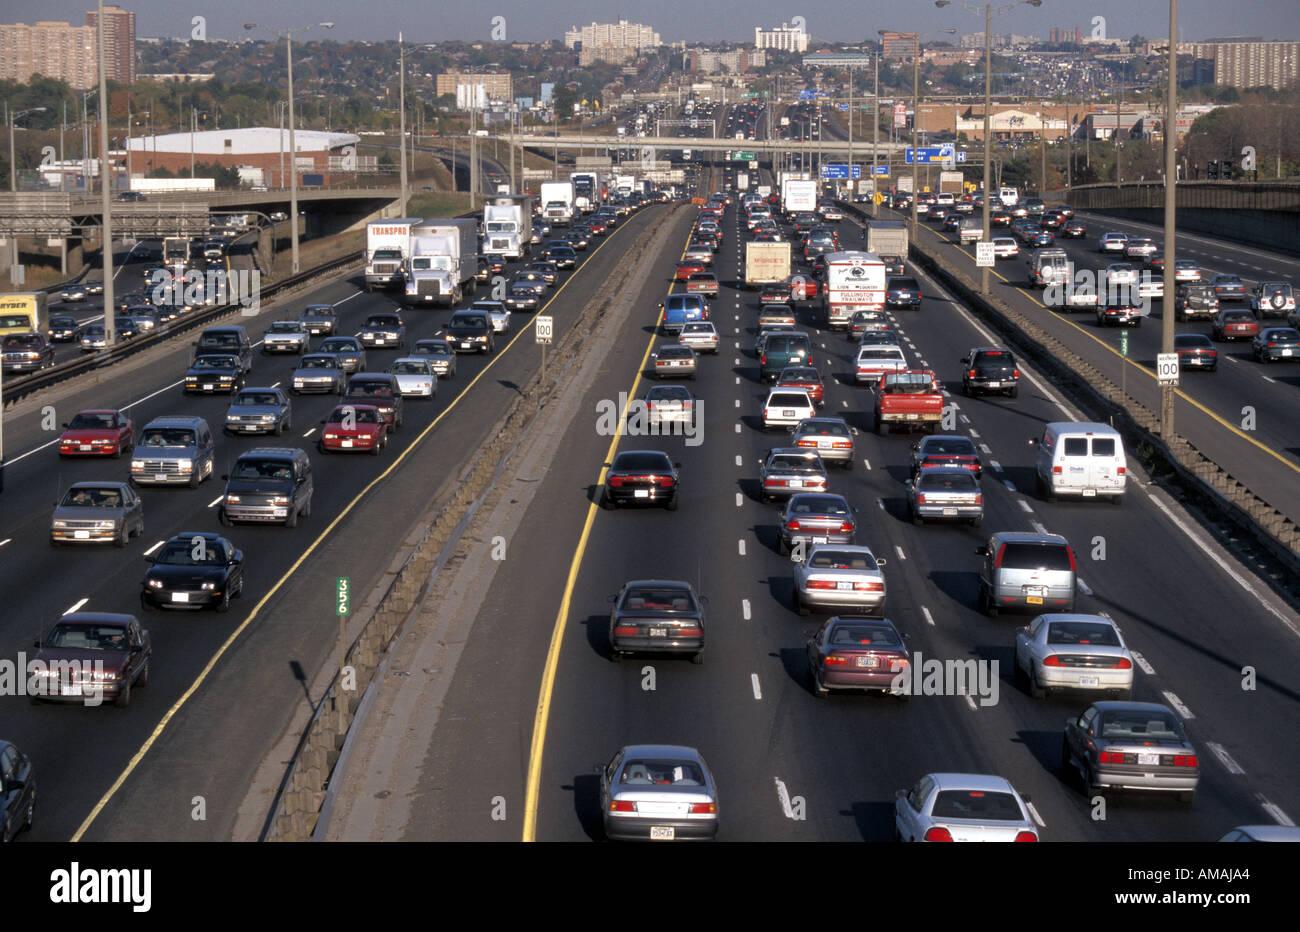 Toronto Canada heavy traffic on Highway 401 Stock Photo: 4962979 - Alamy